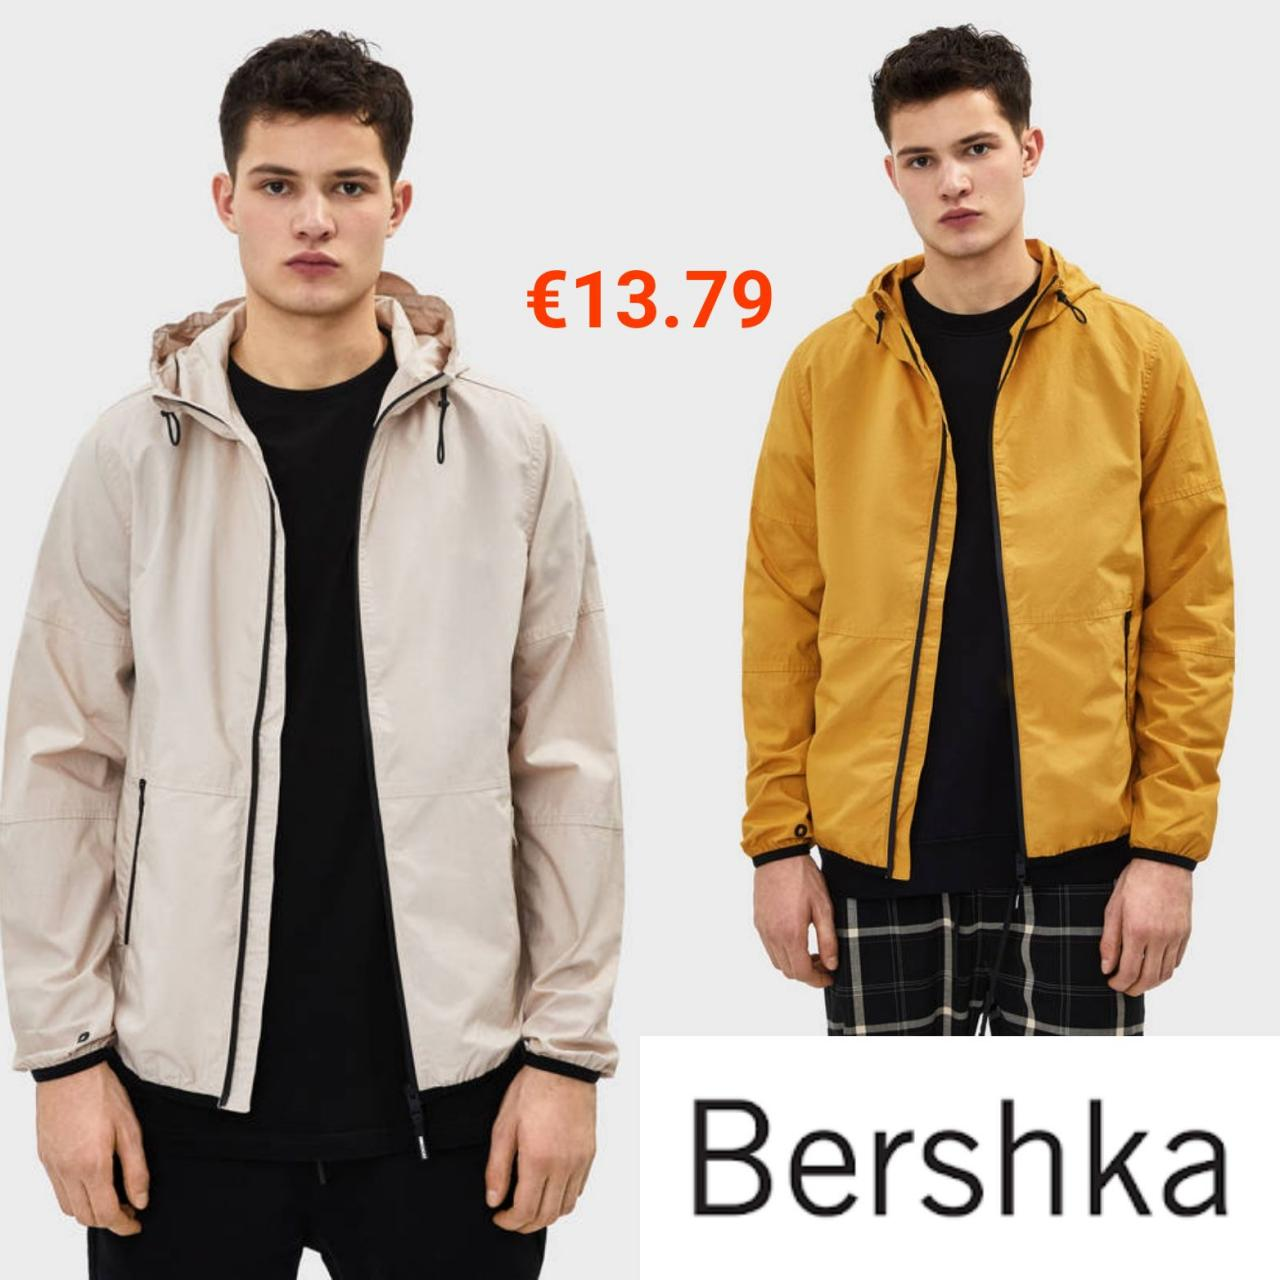 Bershka Интернет Магазин Официальный Сайт Мужская